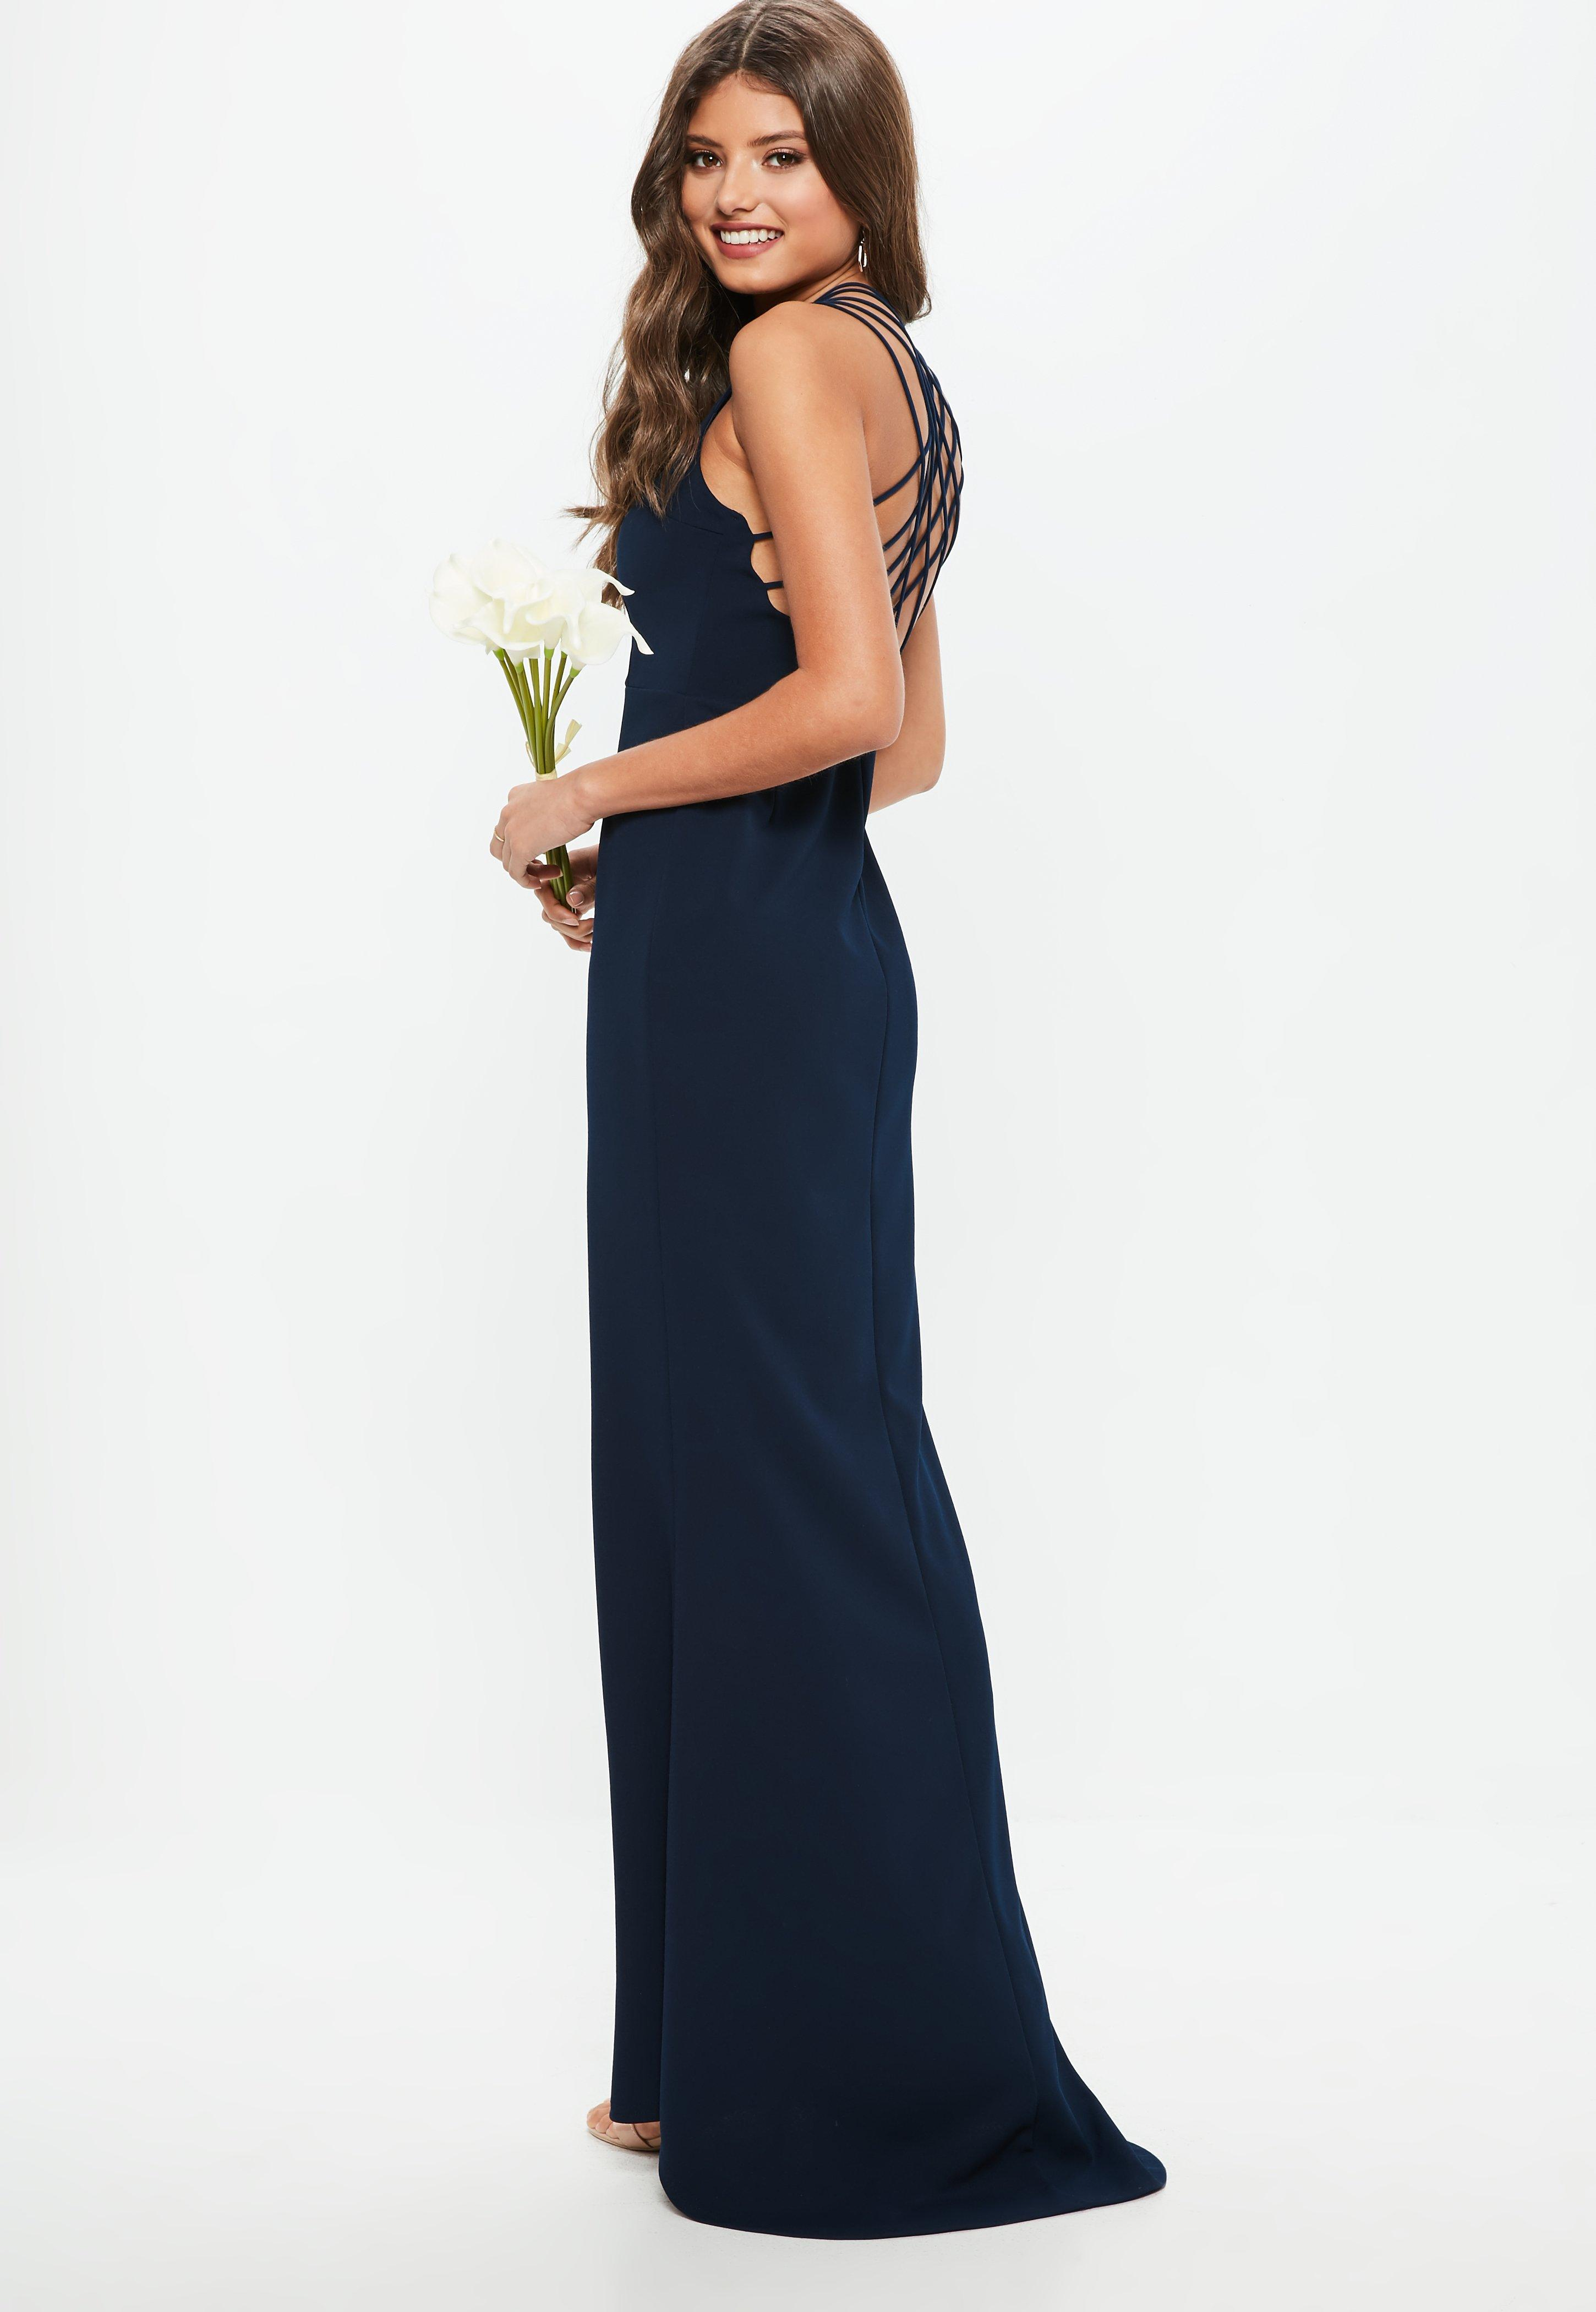 ... Bridesmaids Navy 90s Neck Strappy Fishtail Maxi Dress